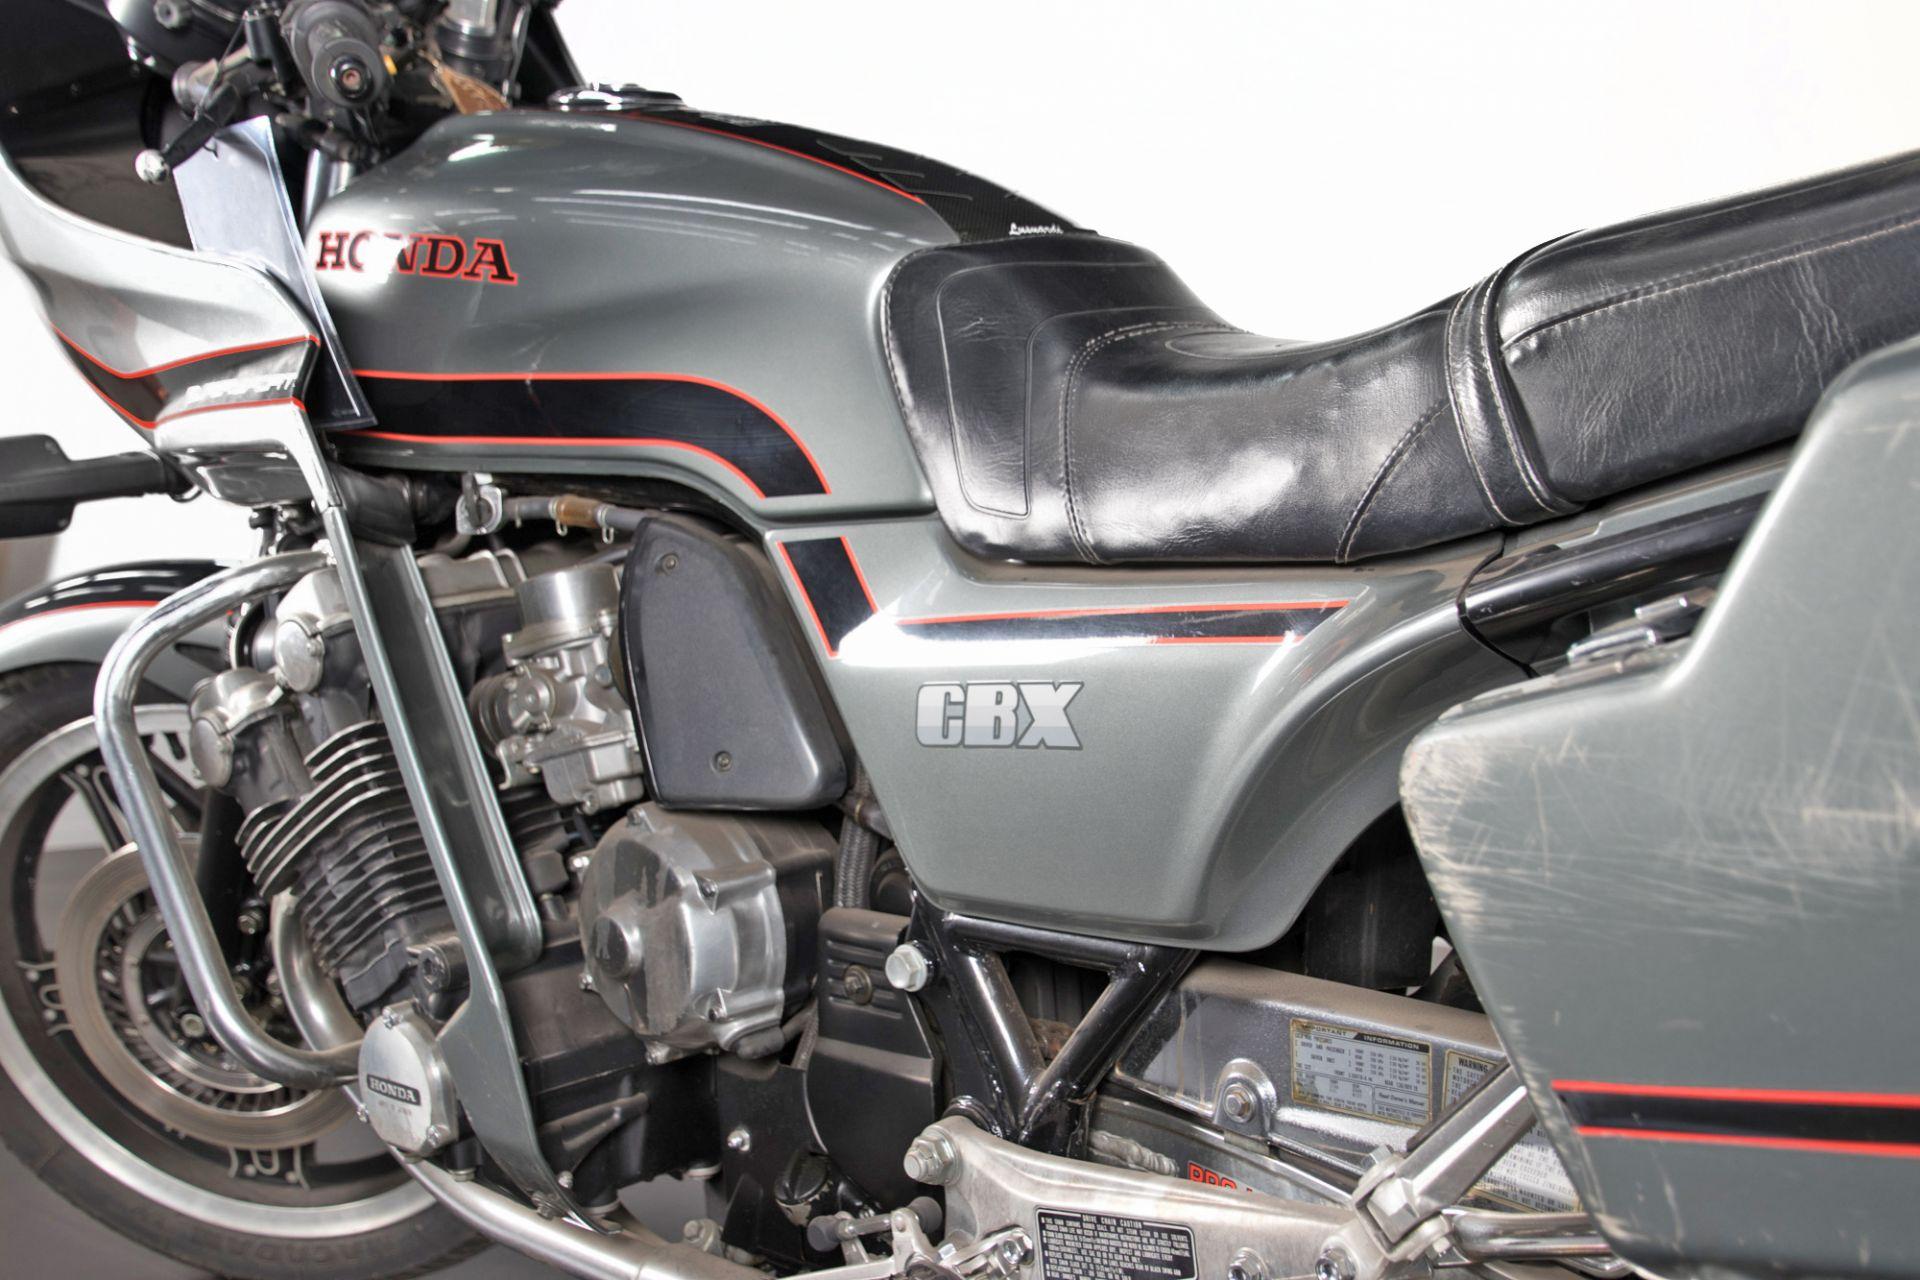 1981 Honda  CBX 1000 74767